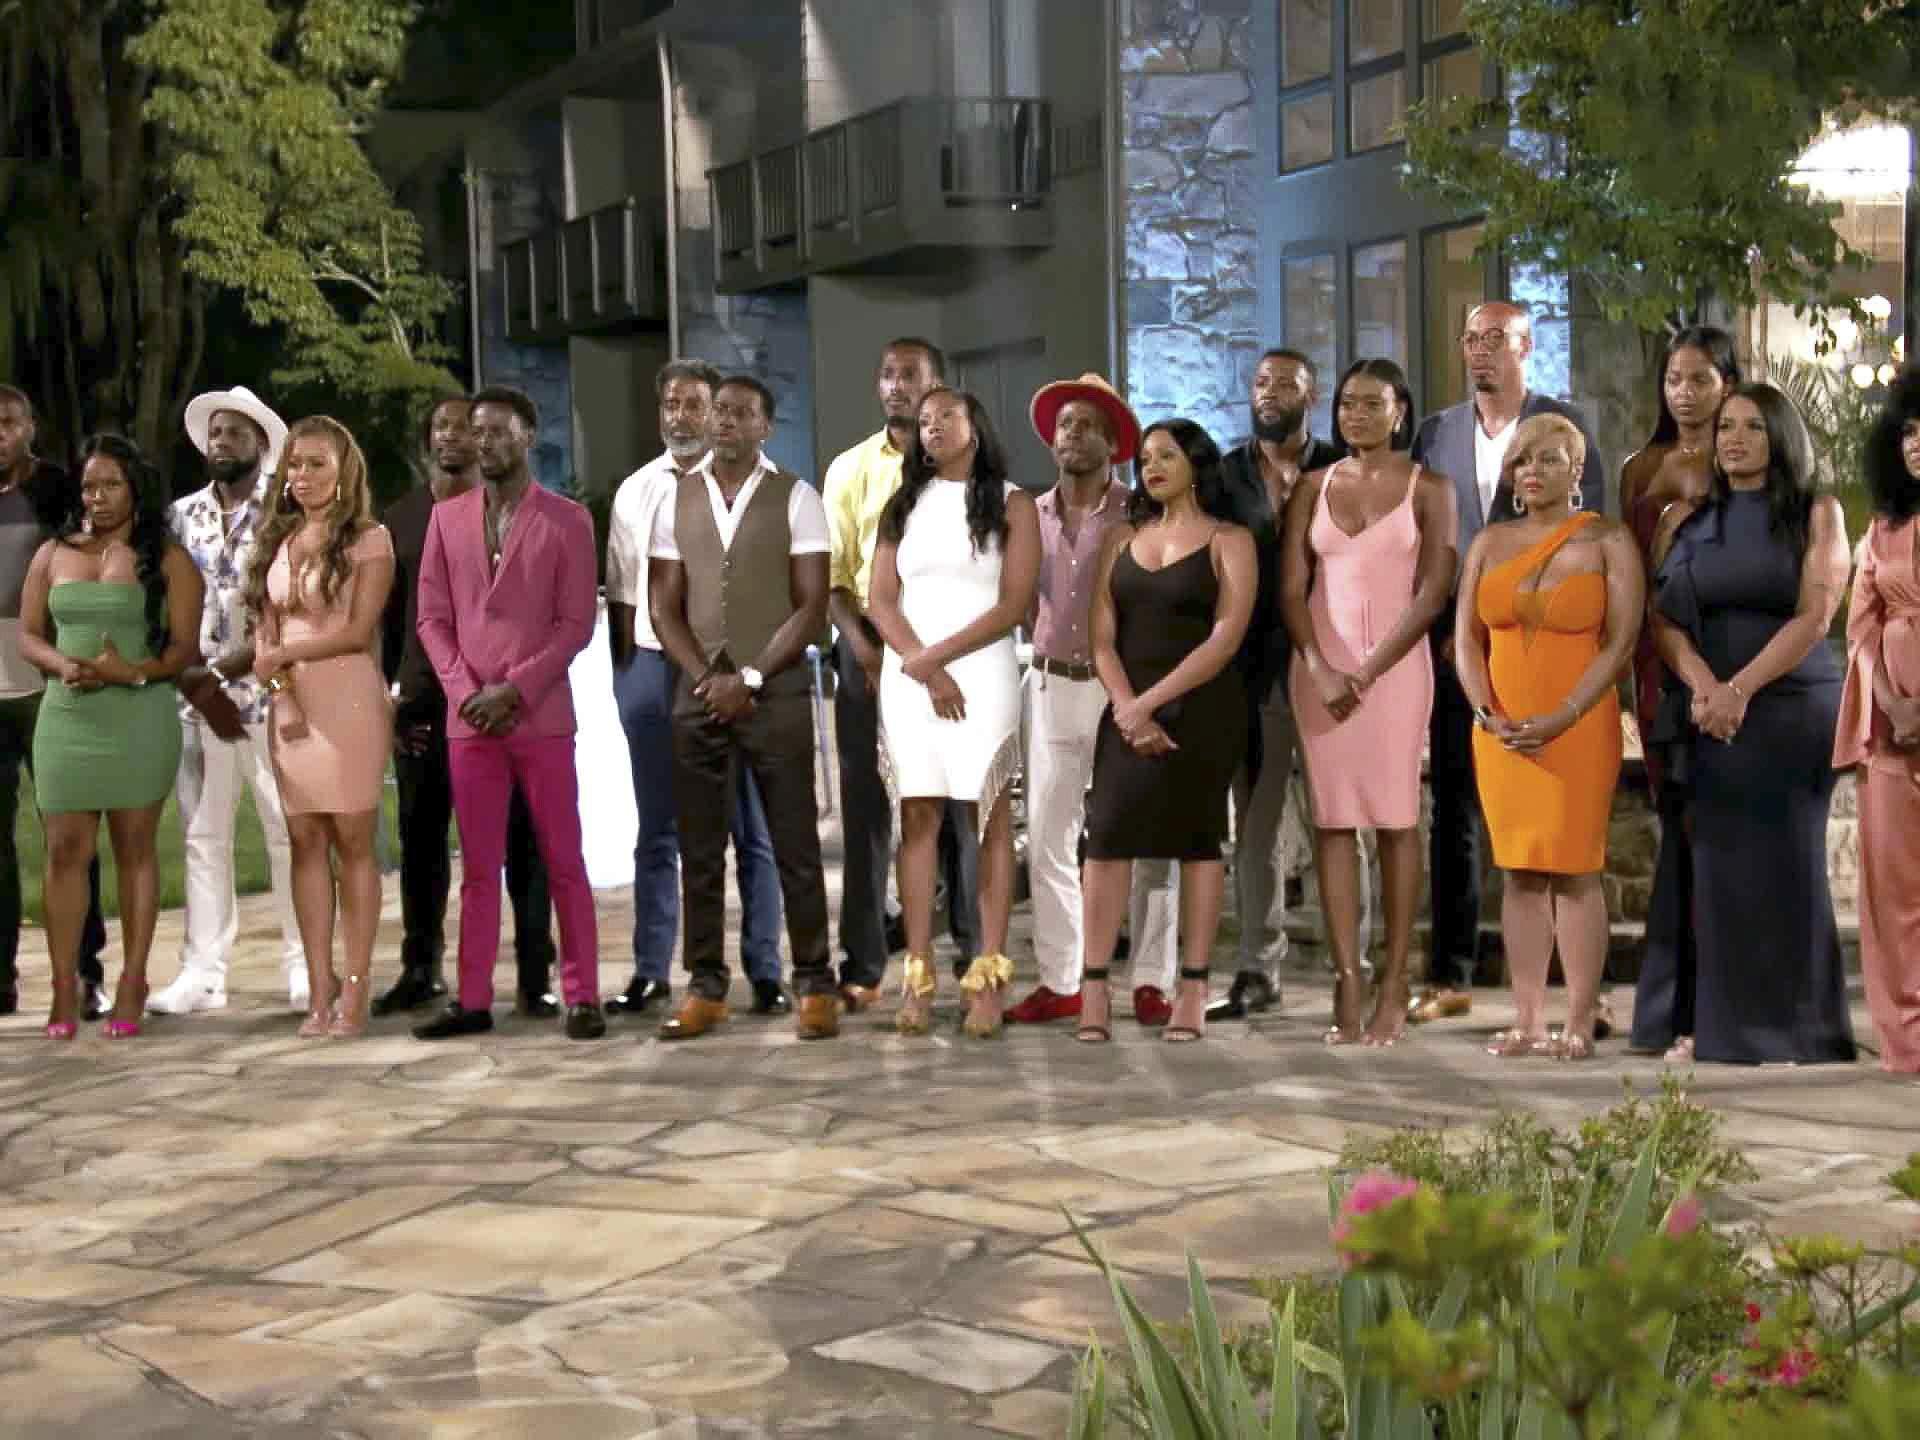 Reunion real season 2 chance of love Real Chance